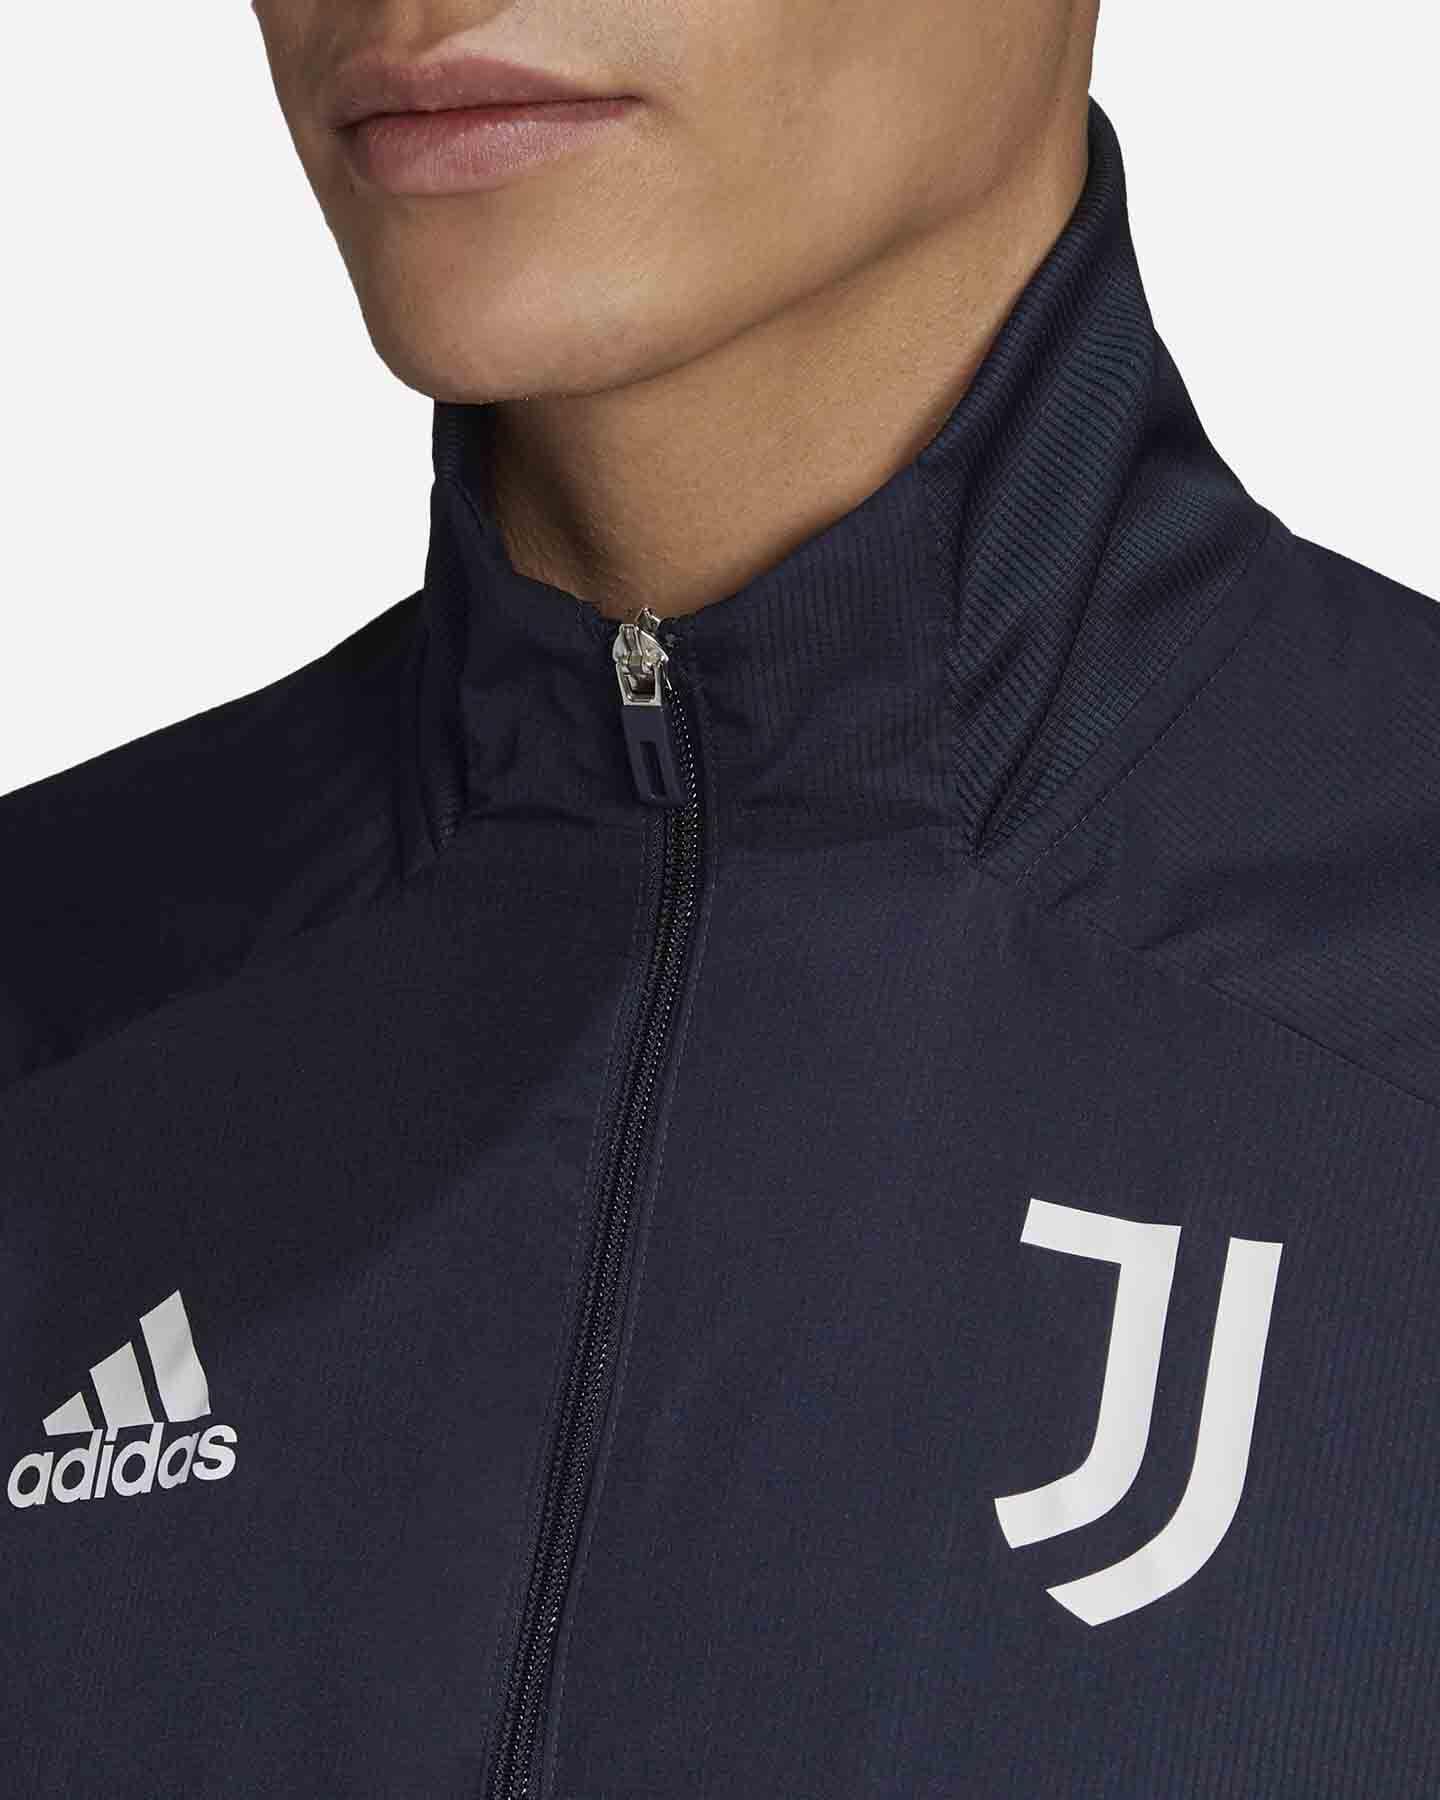 Abbigliamento calcio ADIDAS JUVENTUS PRESENTATION 20/21 M S5217530 scatto 4